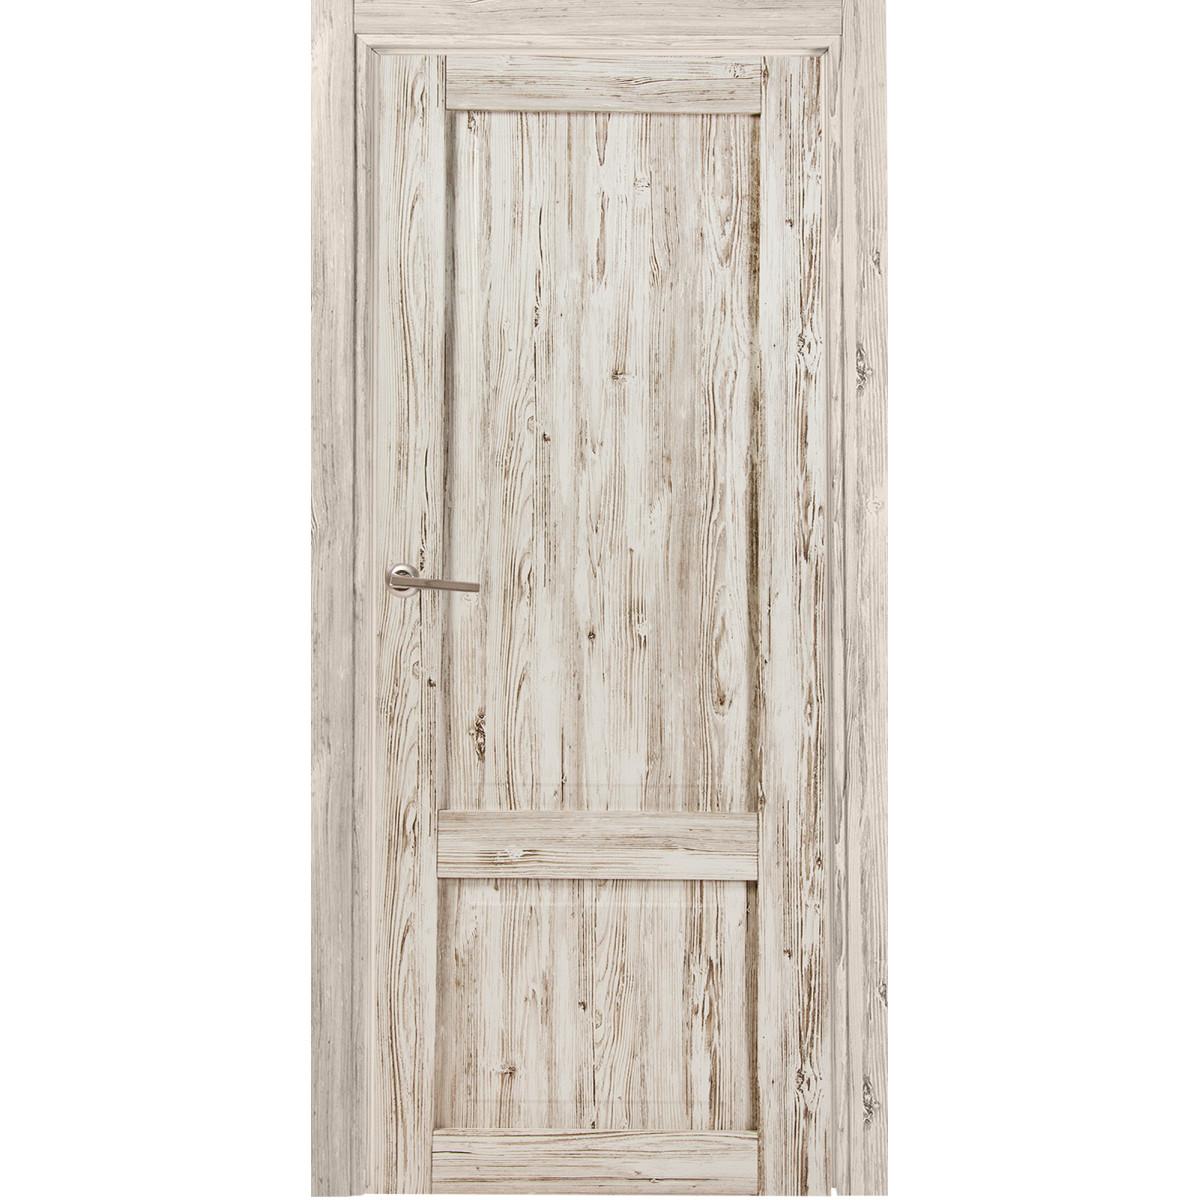 Дверь Межкомнатная Глухая Рустик 60x200 Цвет Северная Сосна